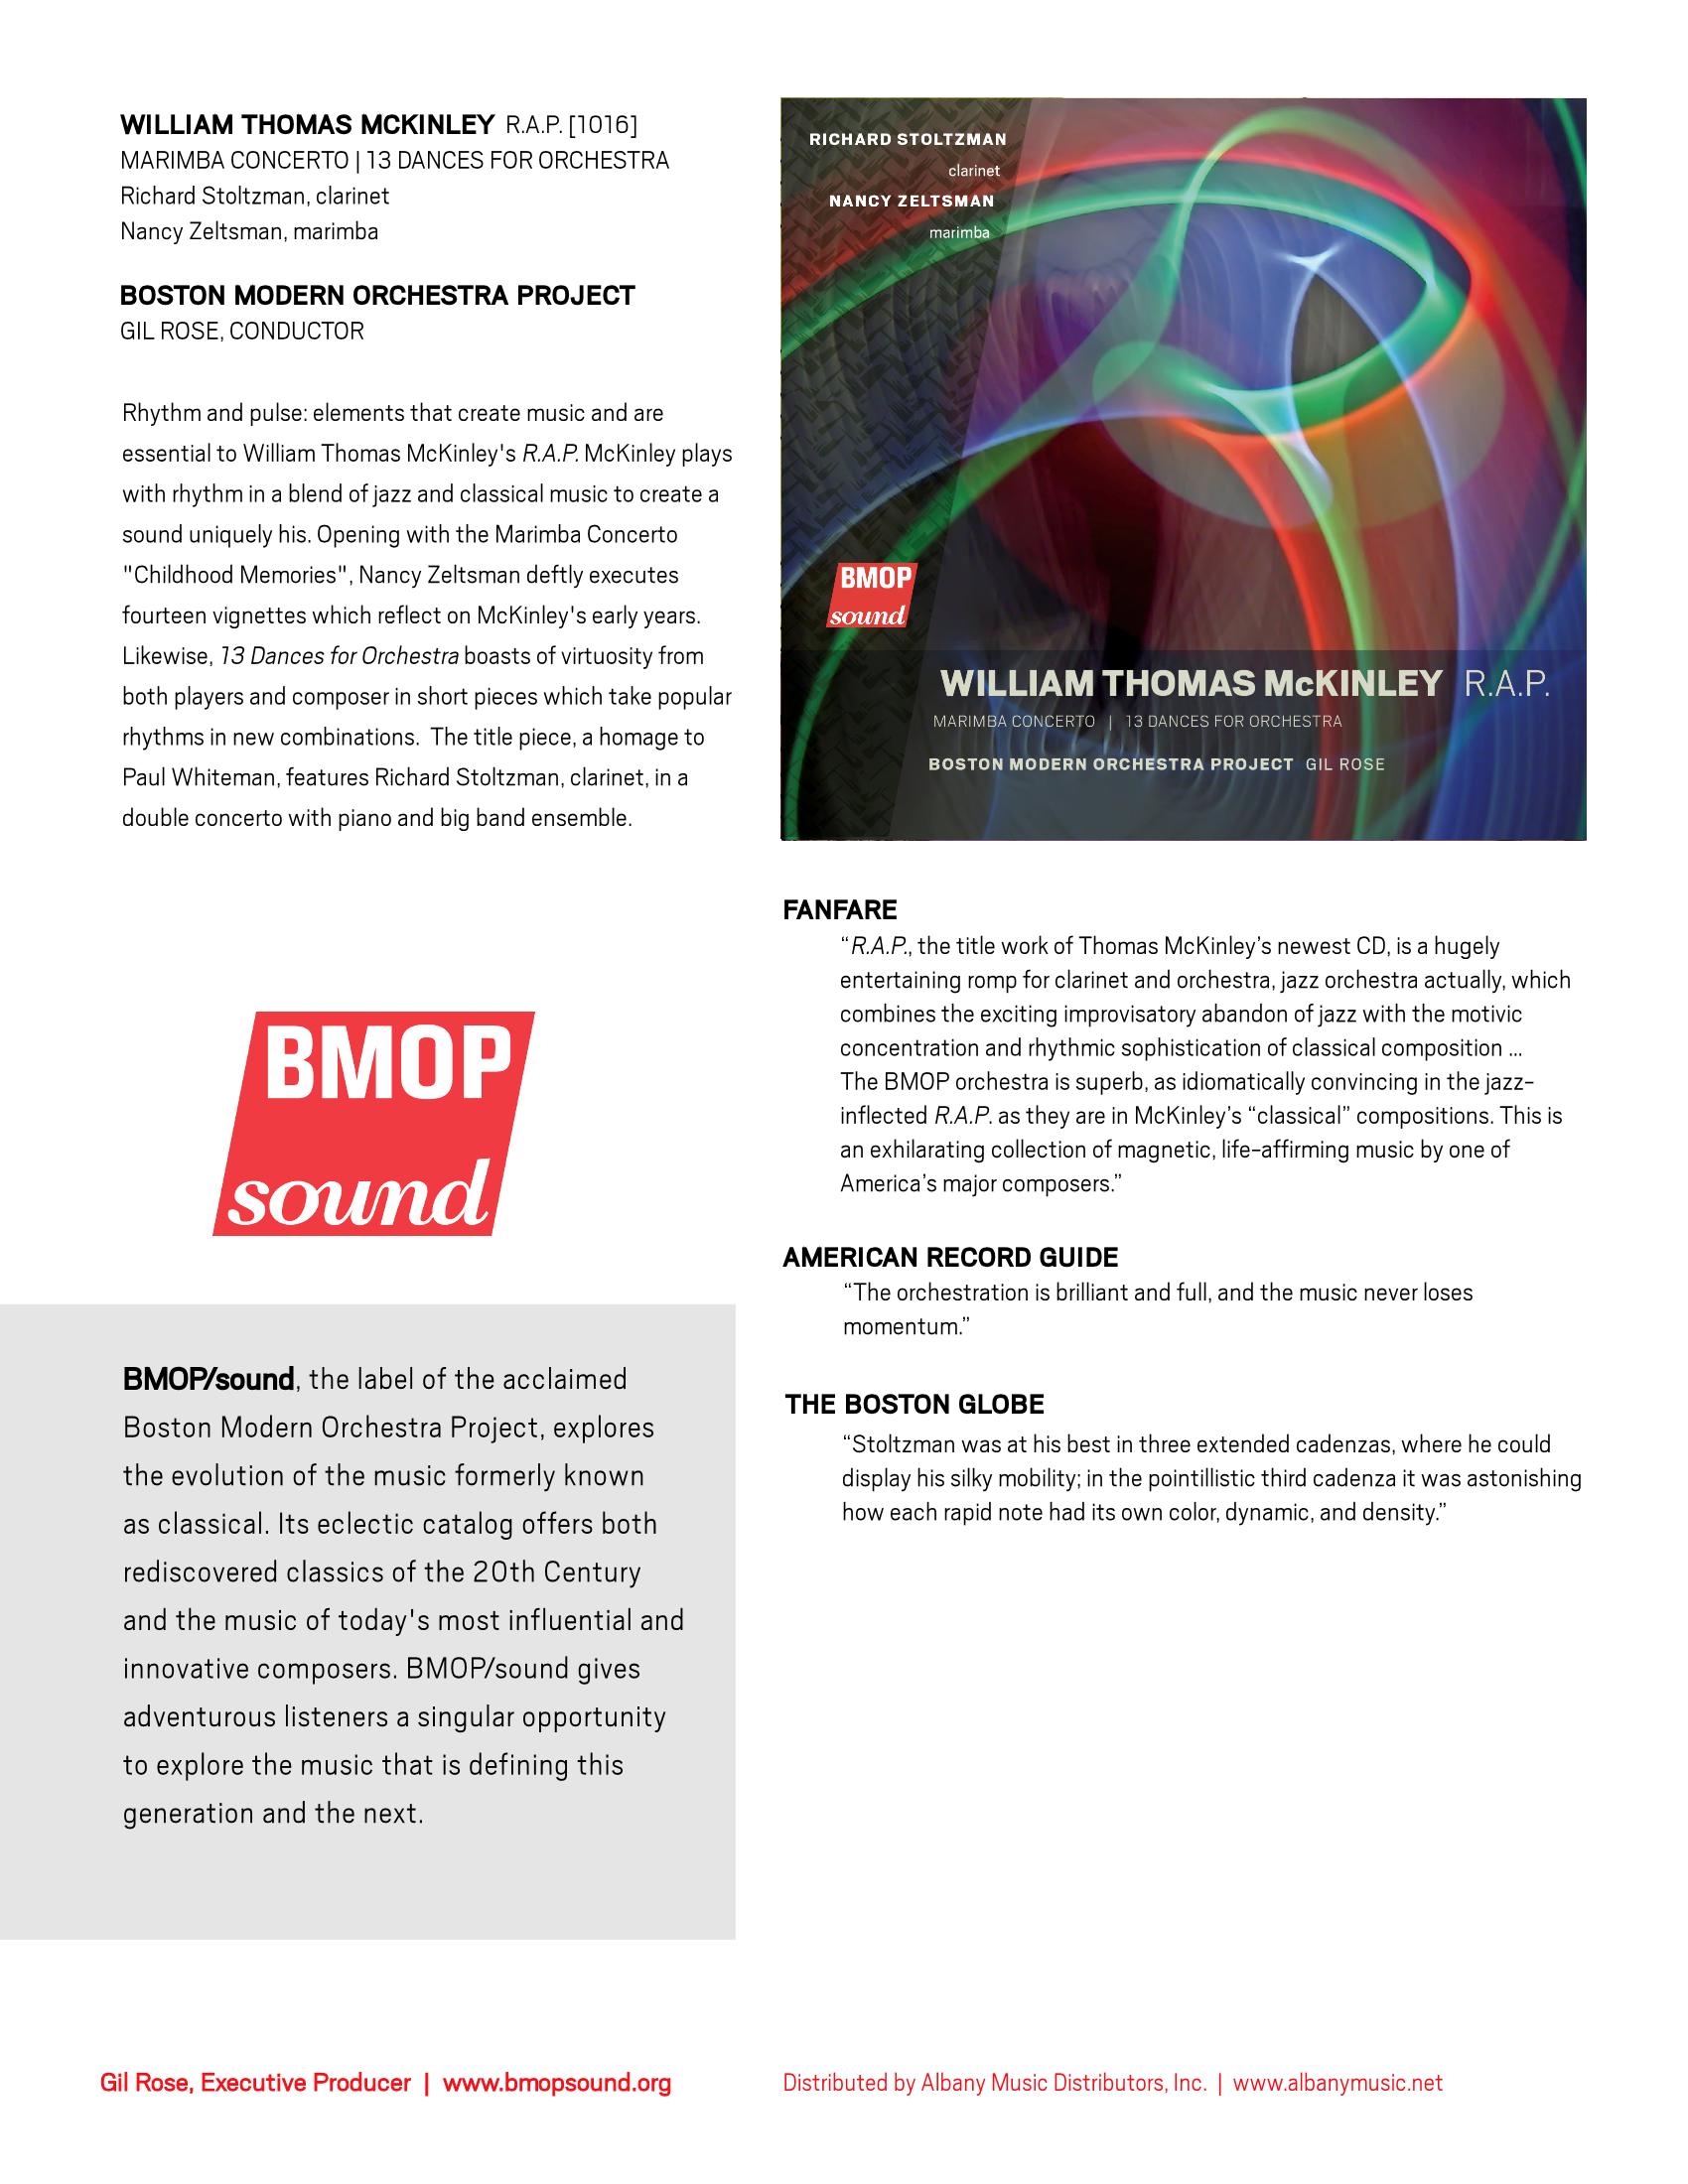 McKinley - BMOPsound 1016 one-sheet.png